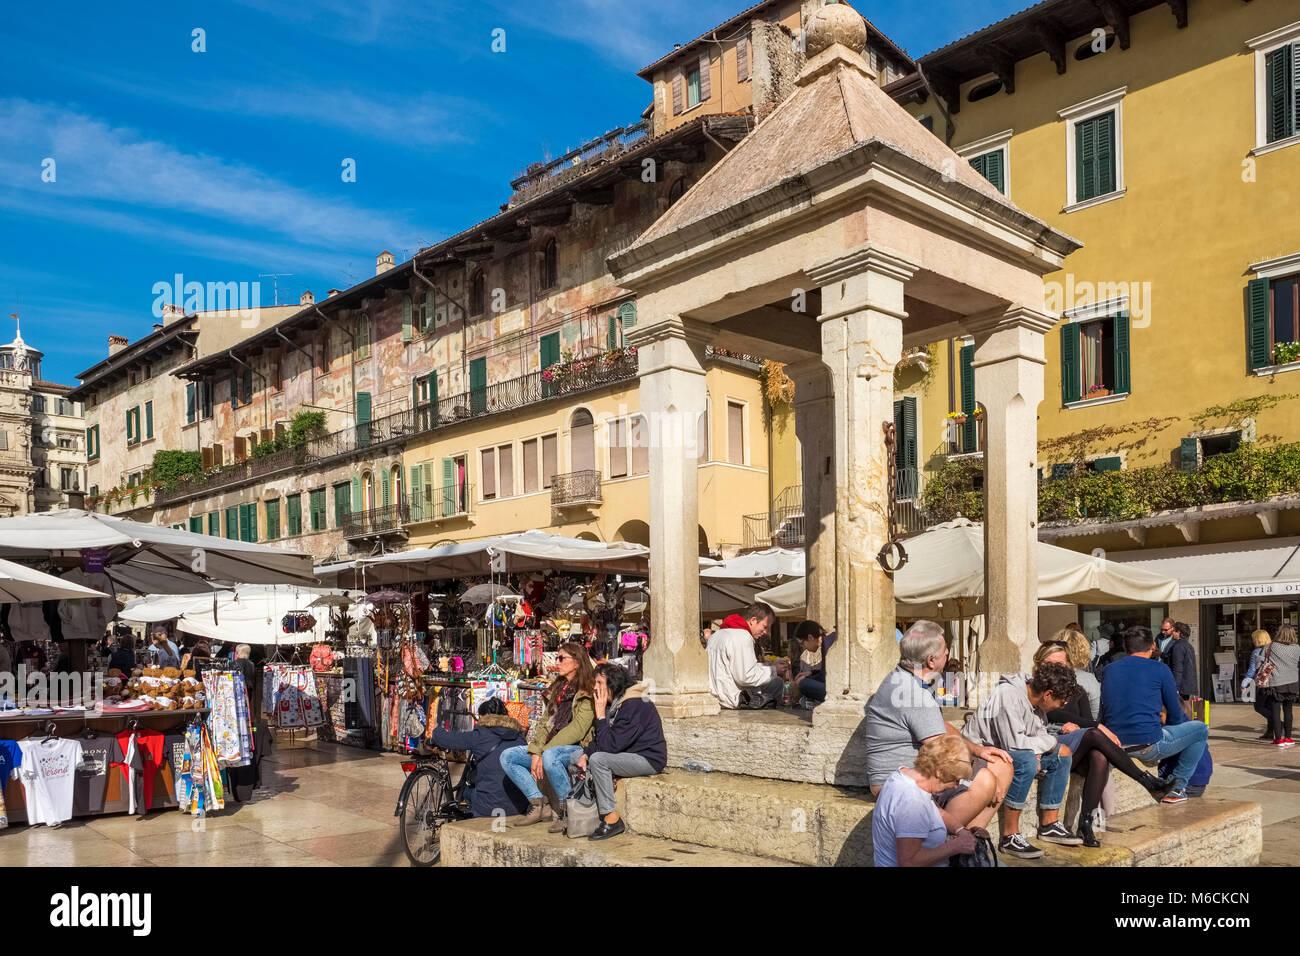 La rue du marché de la Piazza delle Erbe, Vérone, Italie Photo Stock